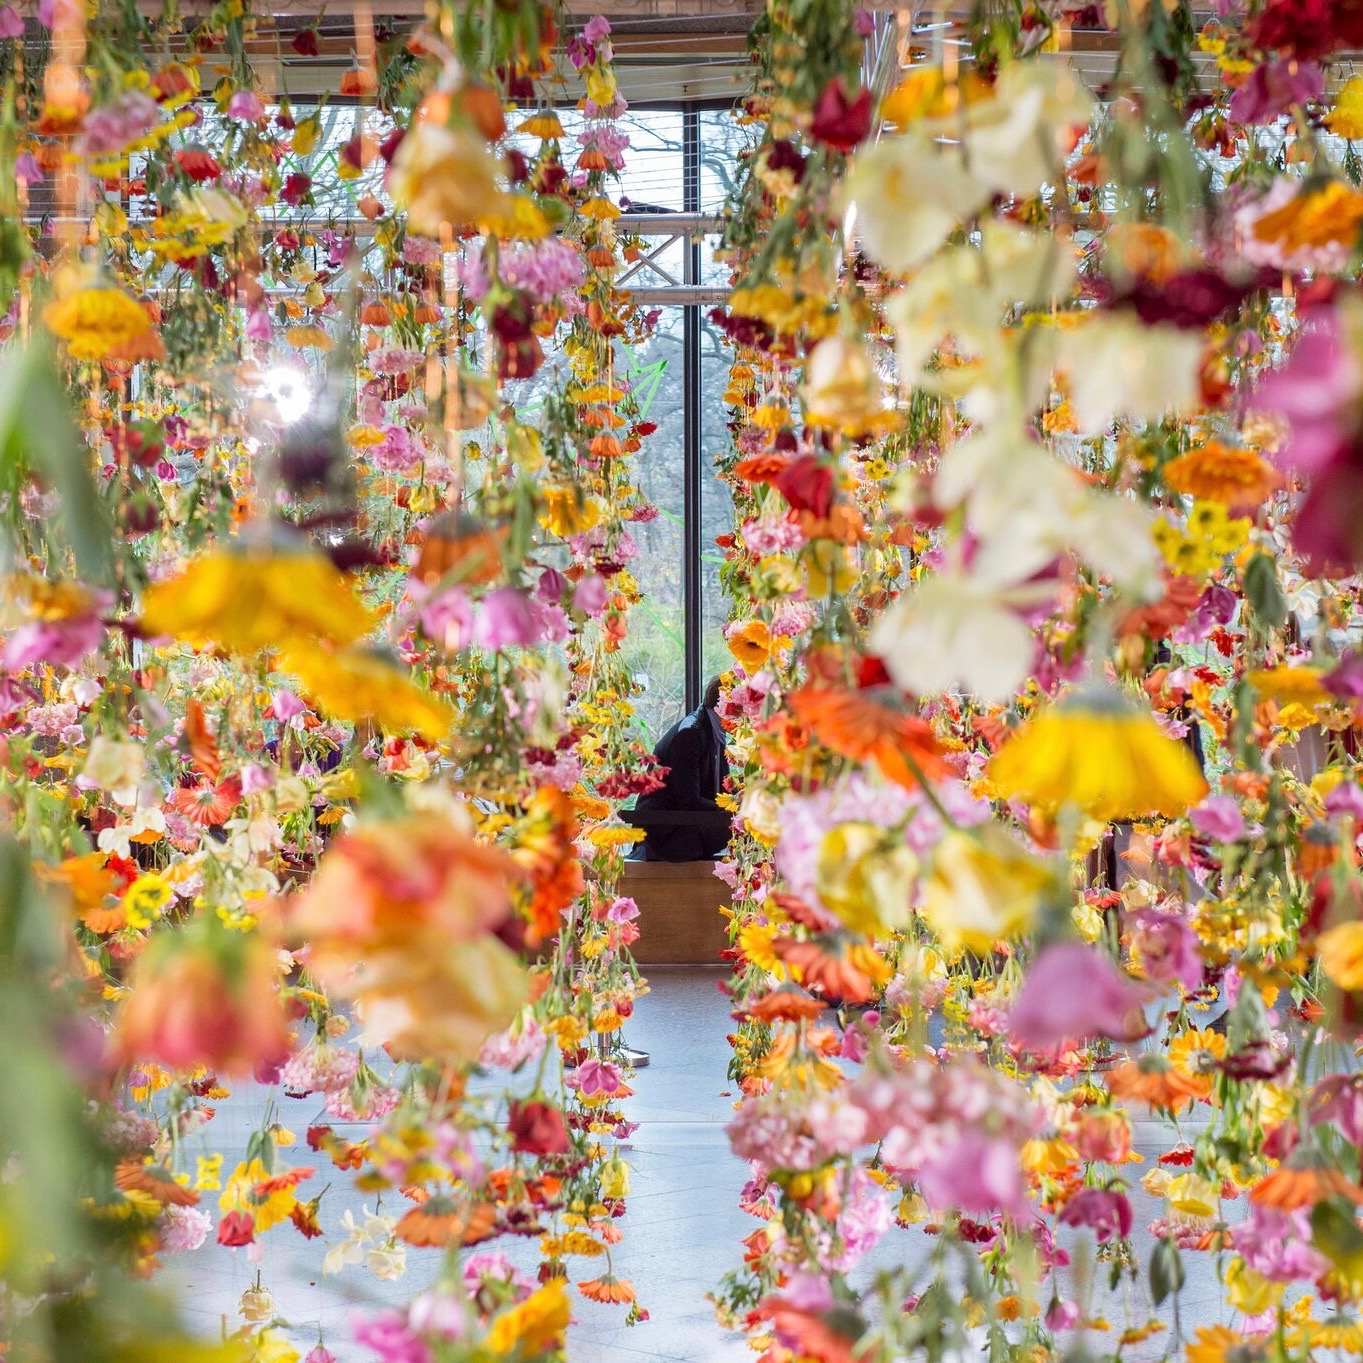 rebecca-louise-laws-floral-installation-at-bikini-berlin-4-1